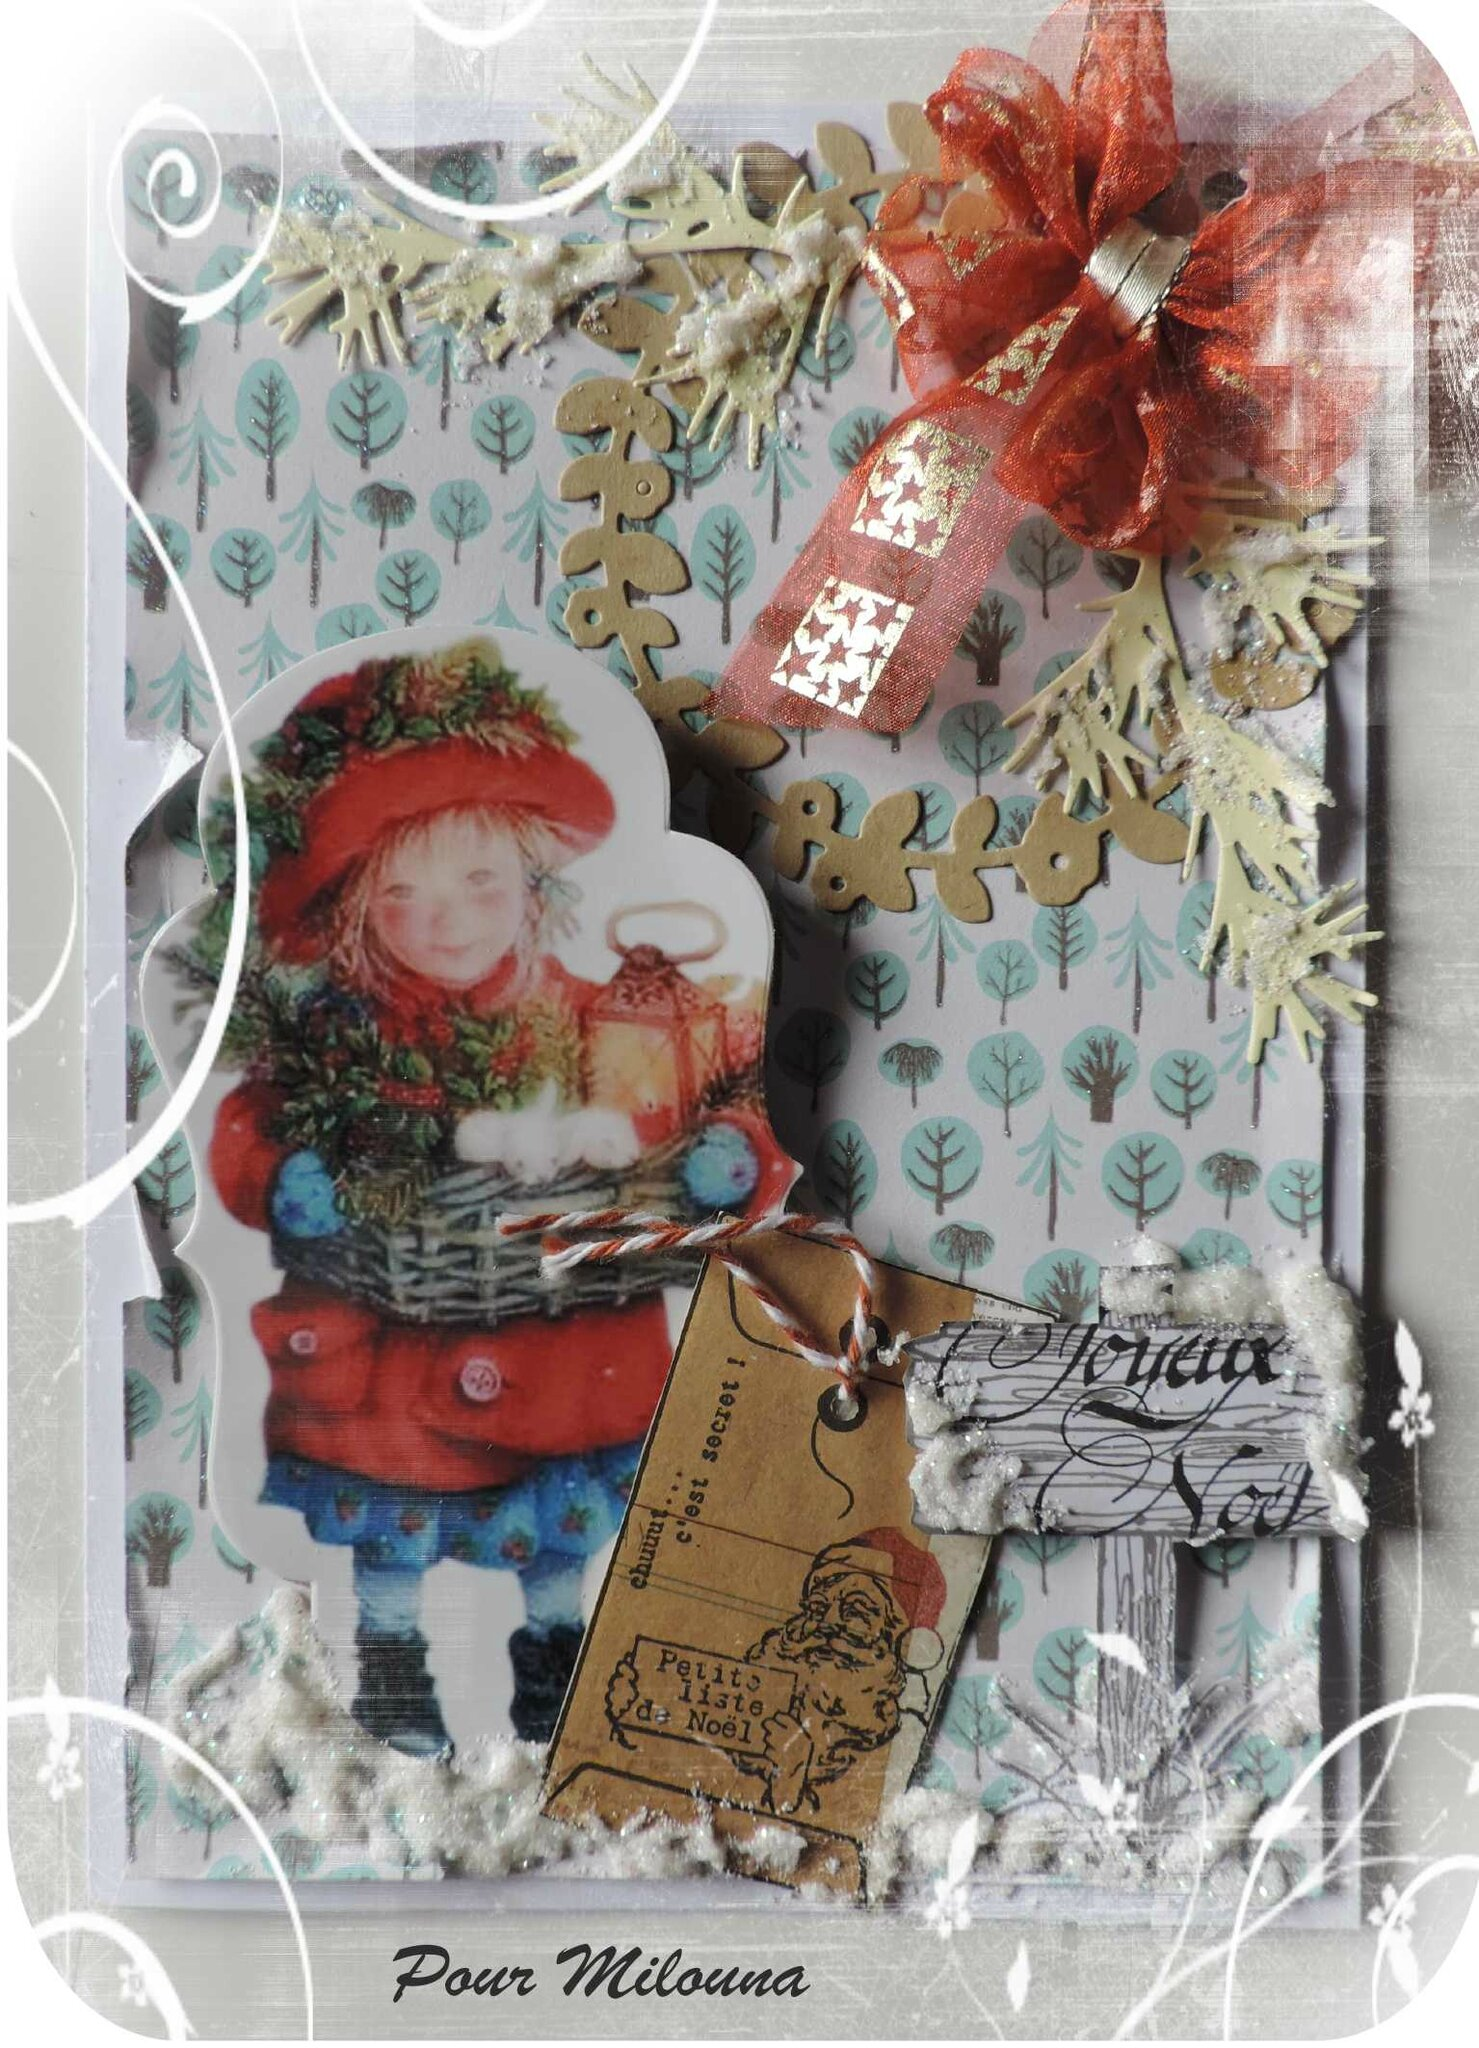 Pour Milouna * Noël 2016 & Vœux 2017